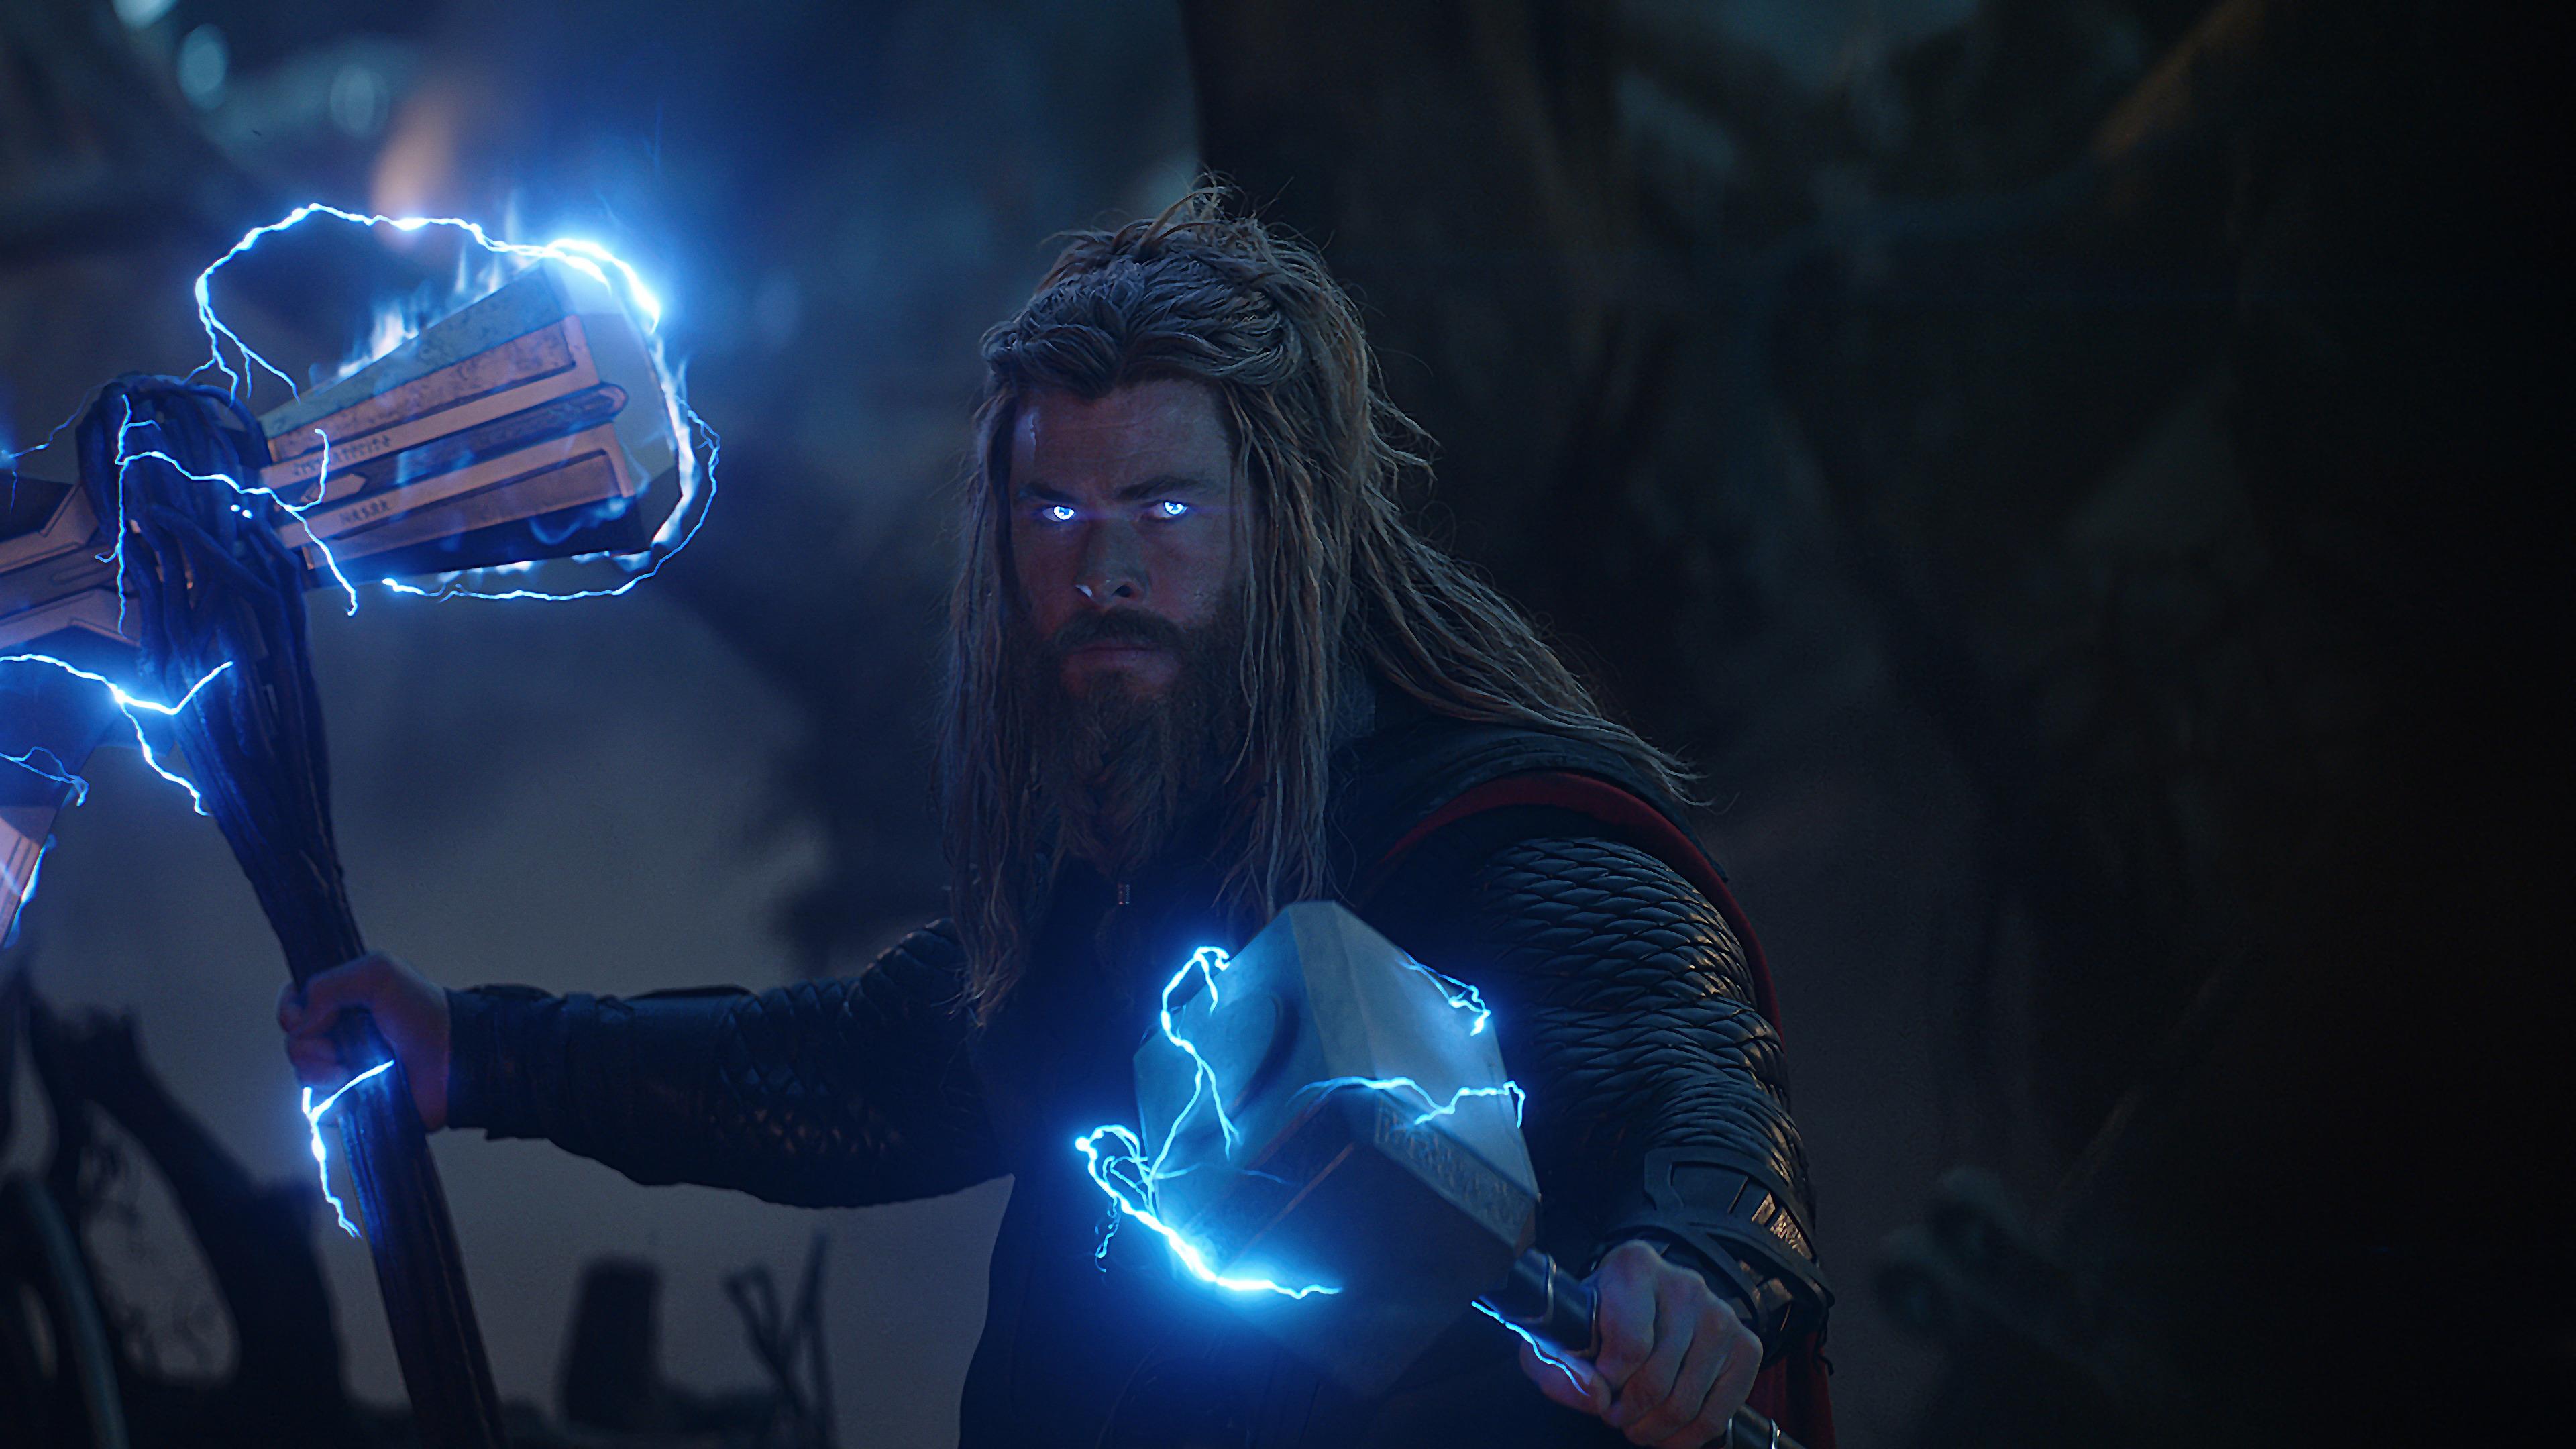 Thor Stormbreaker Lightning Wallpapers Wallpaper Cave